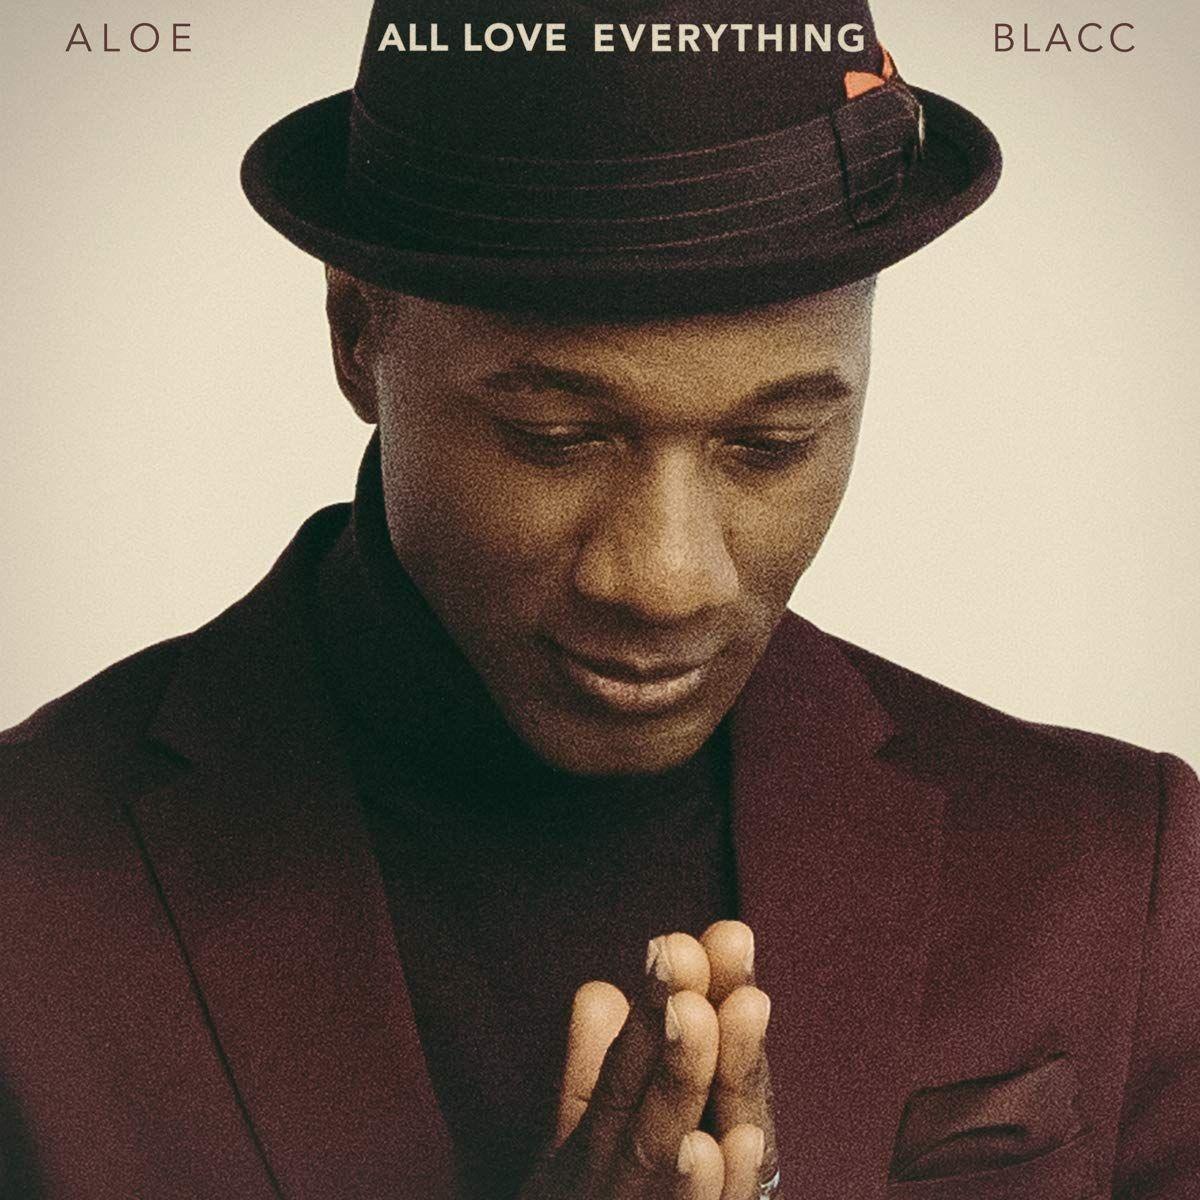 BLACC ALOE – All Love Everything